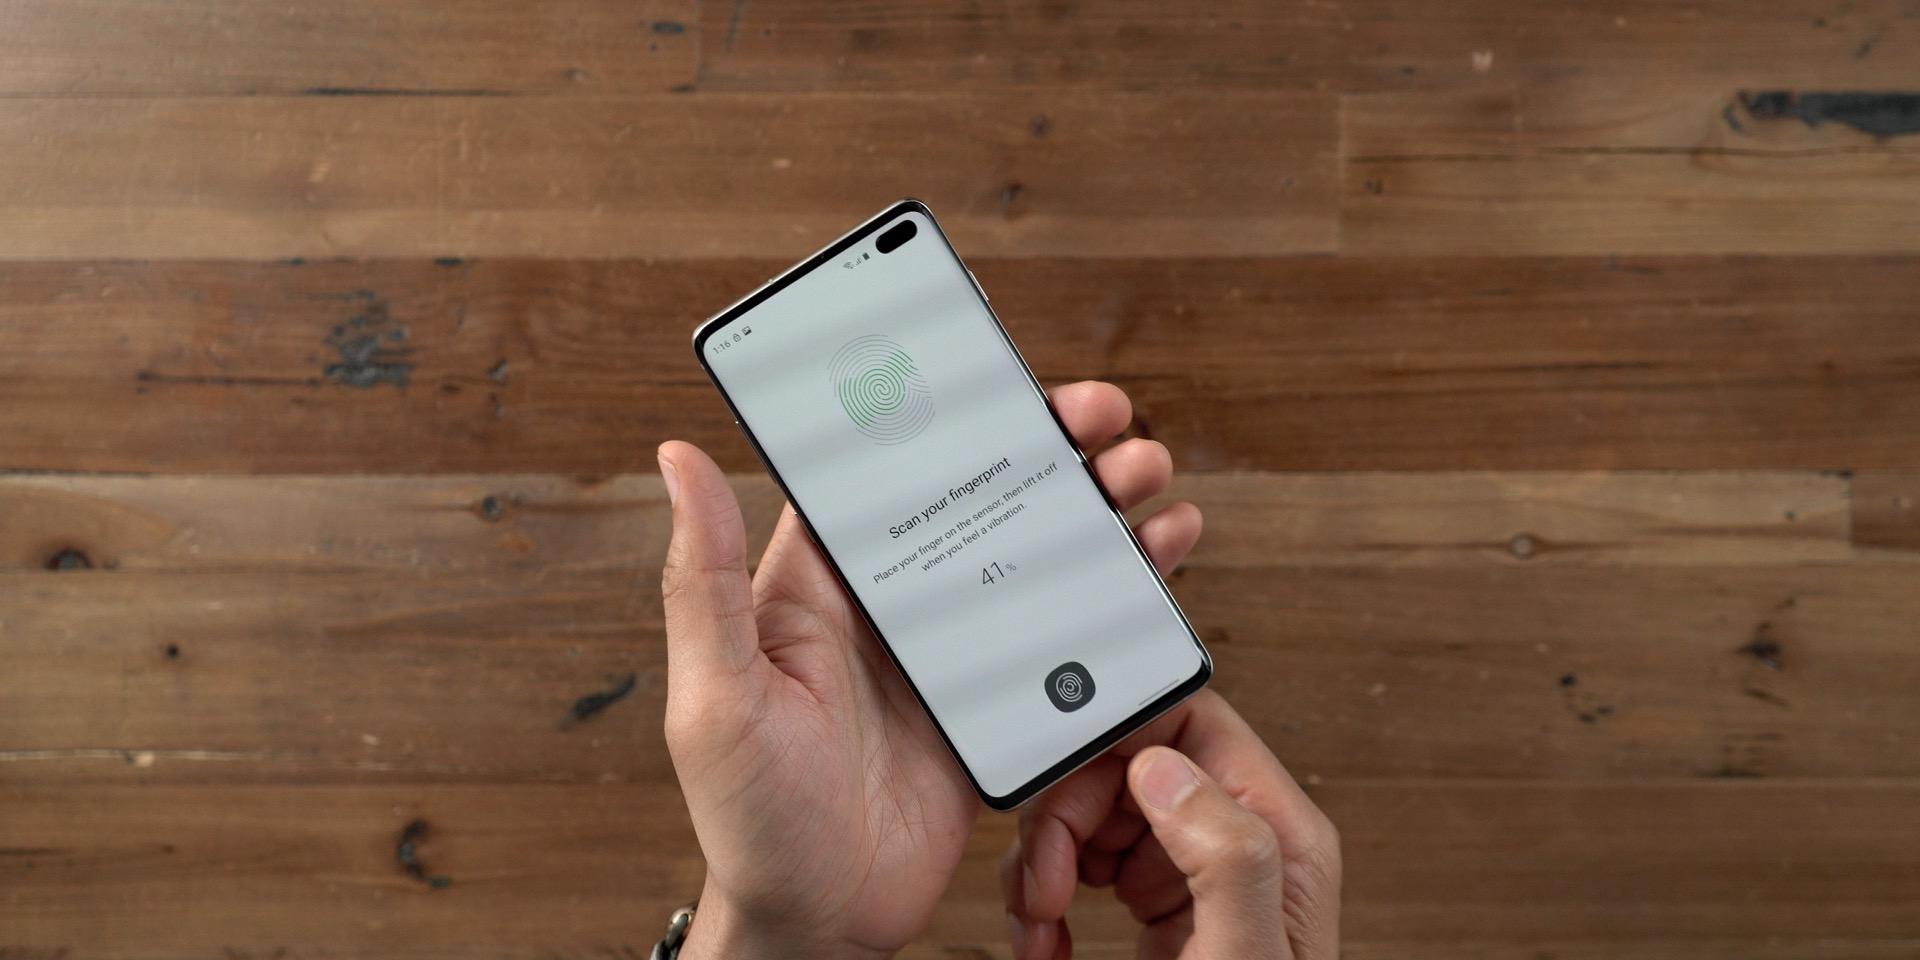 Galaxy S10+ vs iPhone Fingerprint Sensor